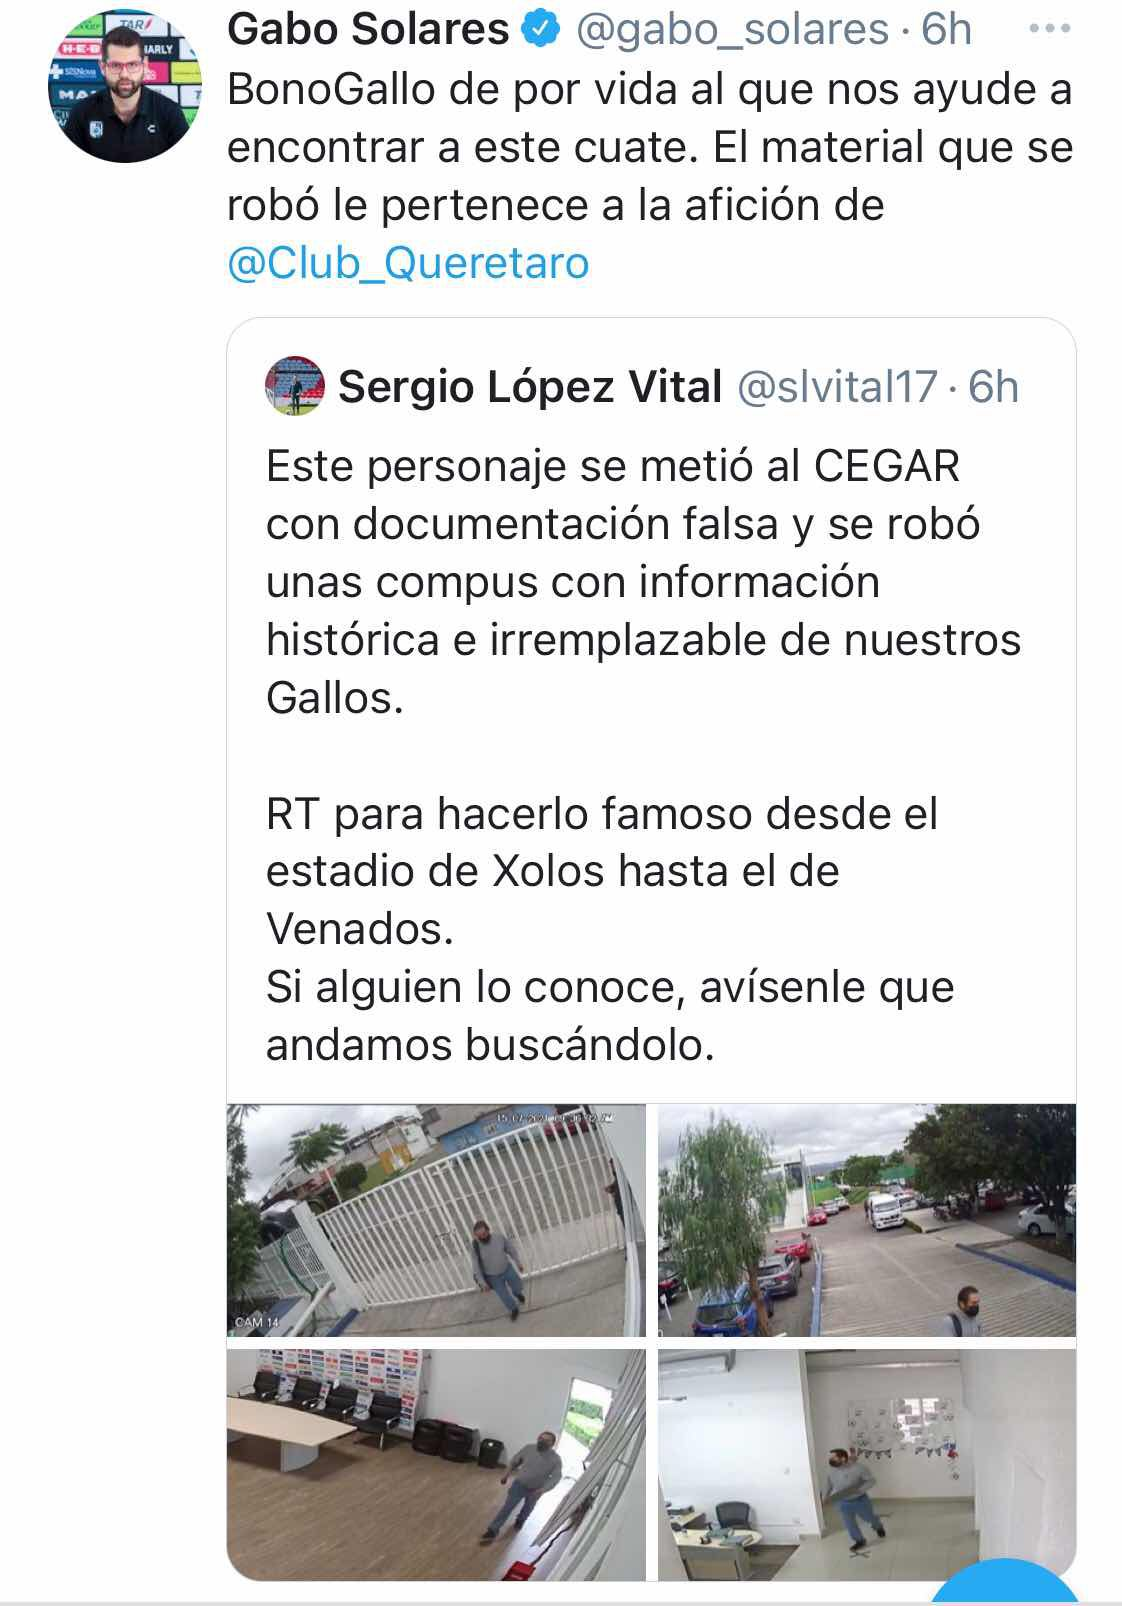 Club Querétaro ofreció recompensa para encontrar al culpable del robo (Foto: Twitter@Gabo_Solares)